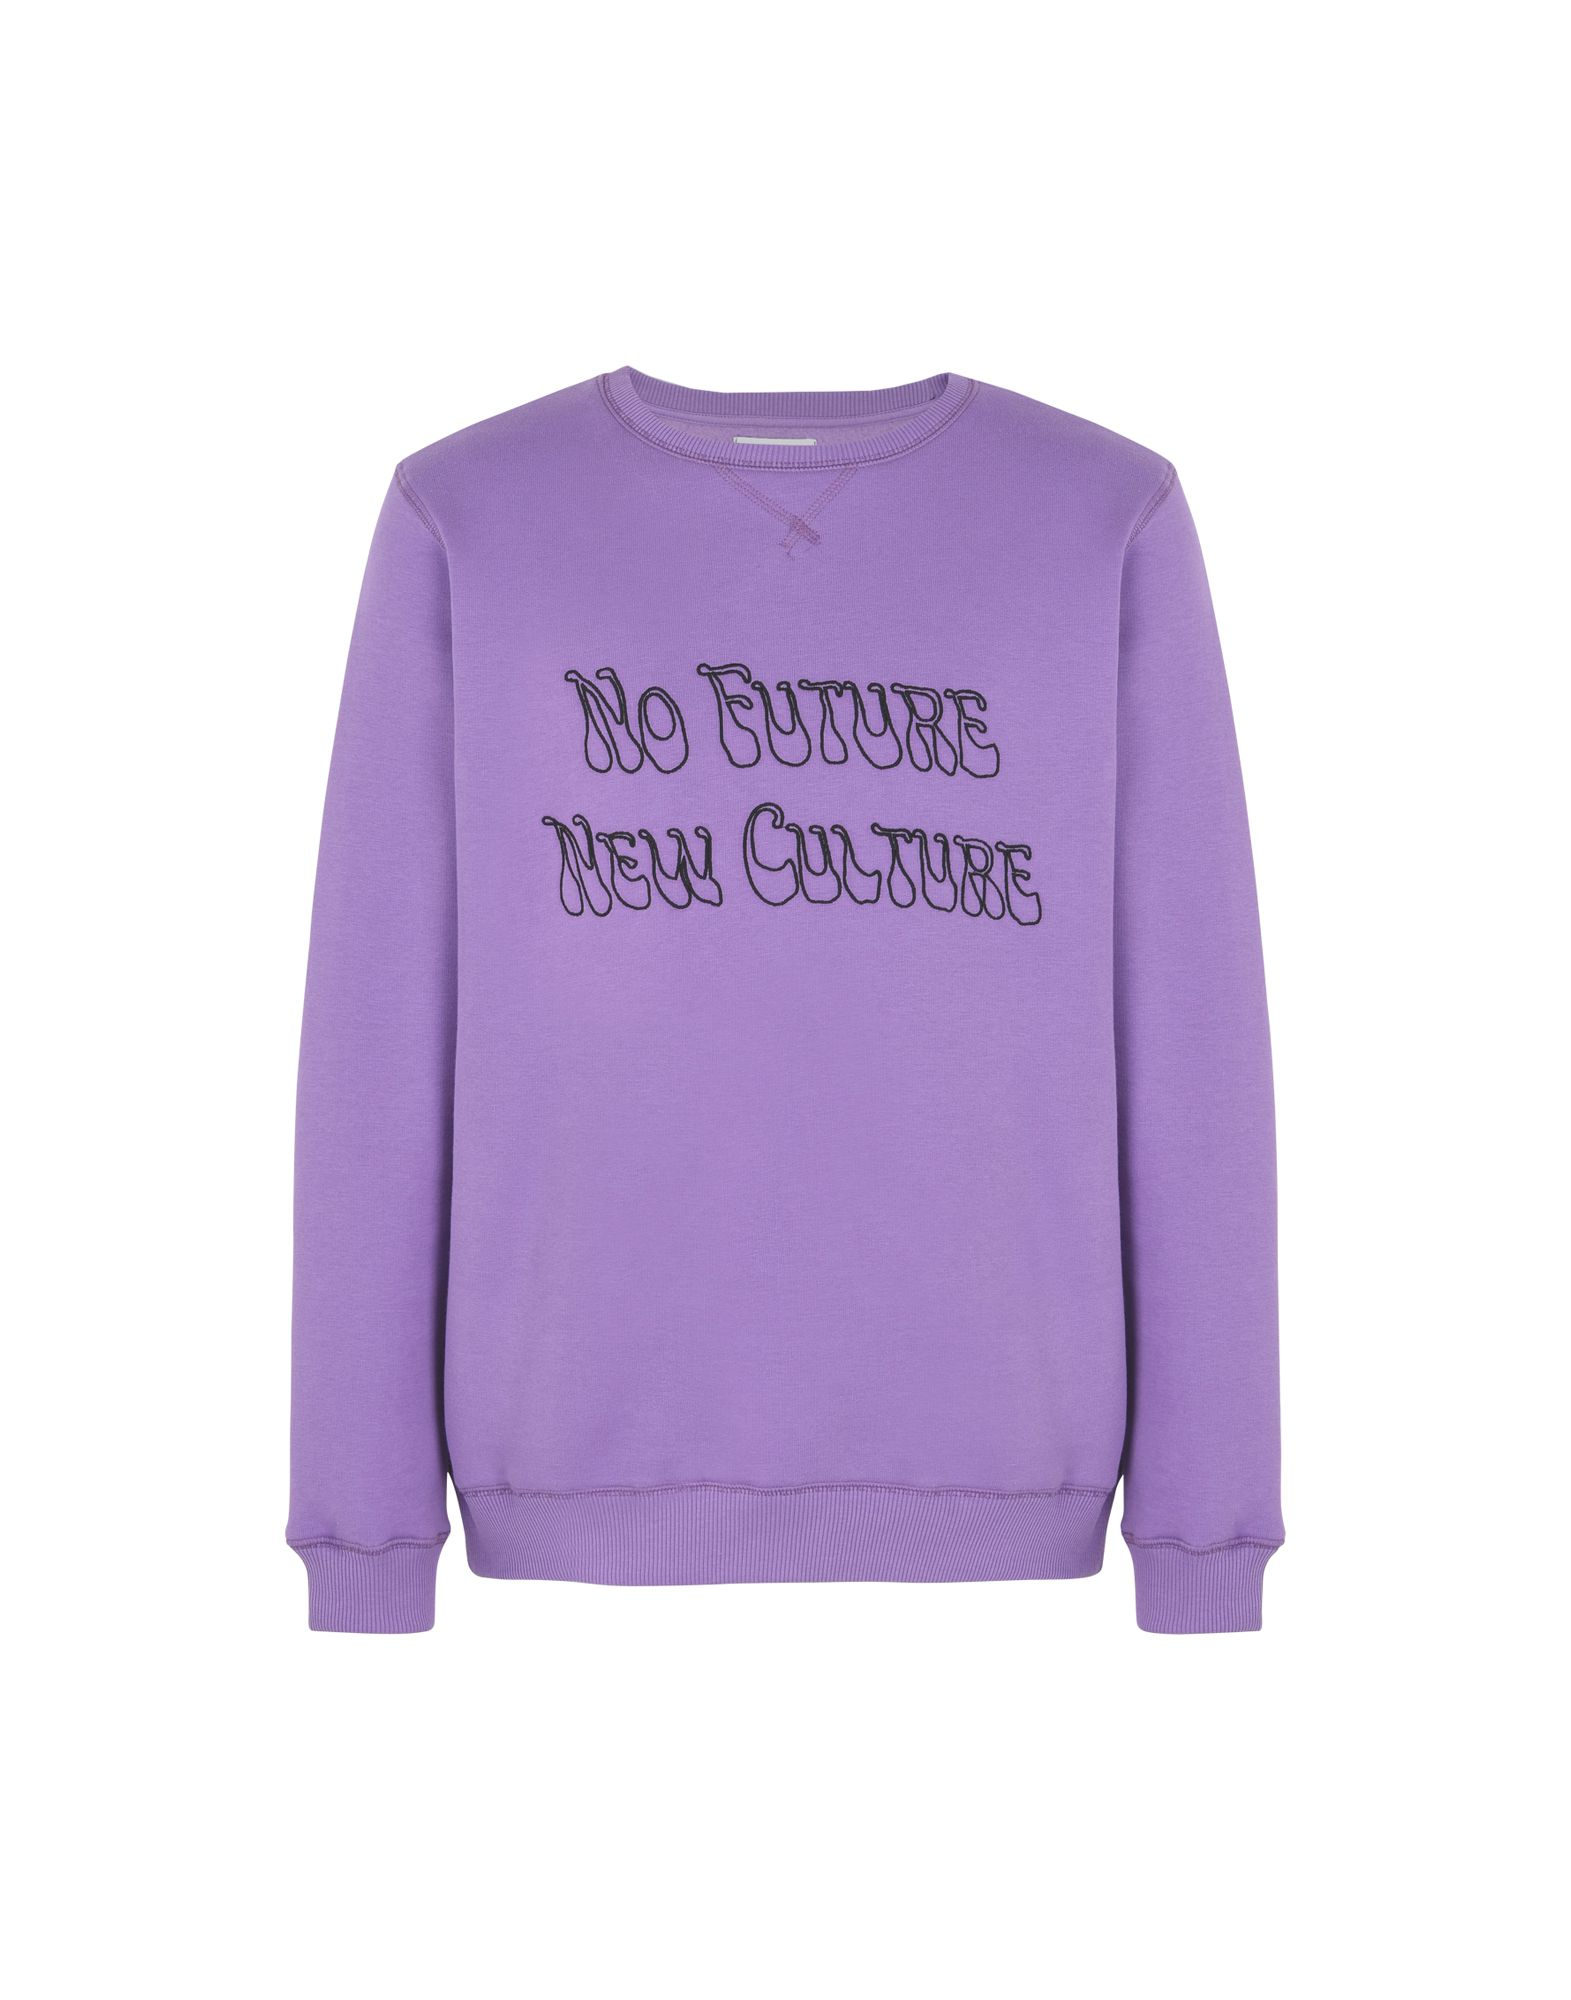 SOULLAND Sweatshirt in Mauve